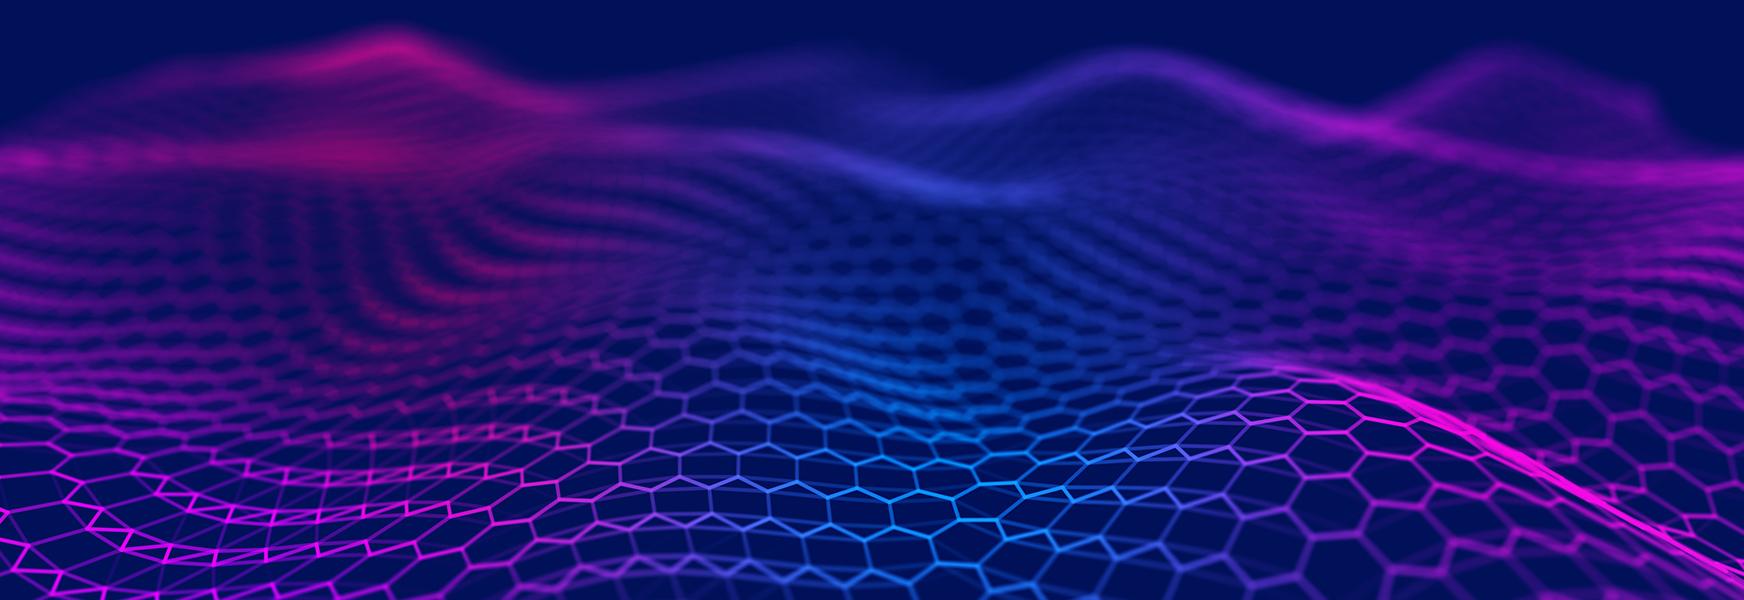 Purple abstract hexagonal wave